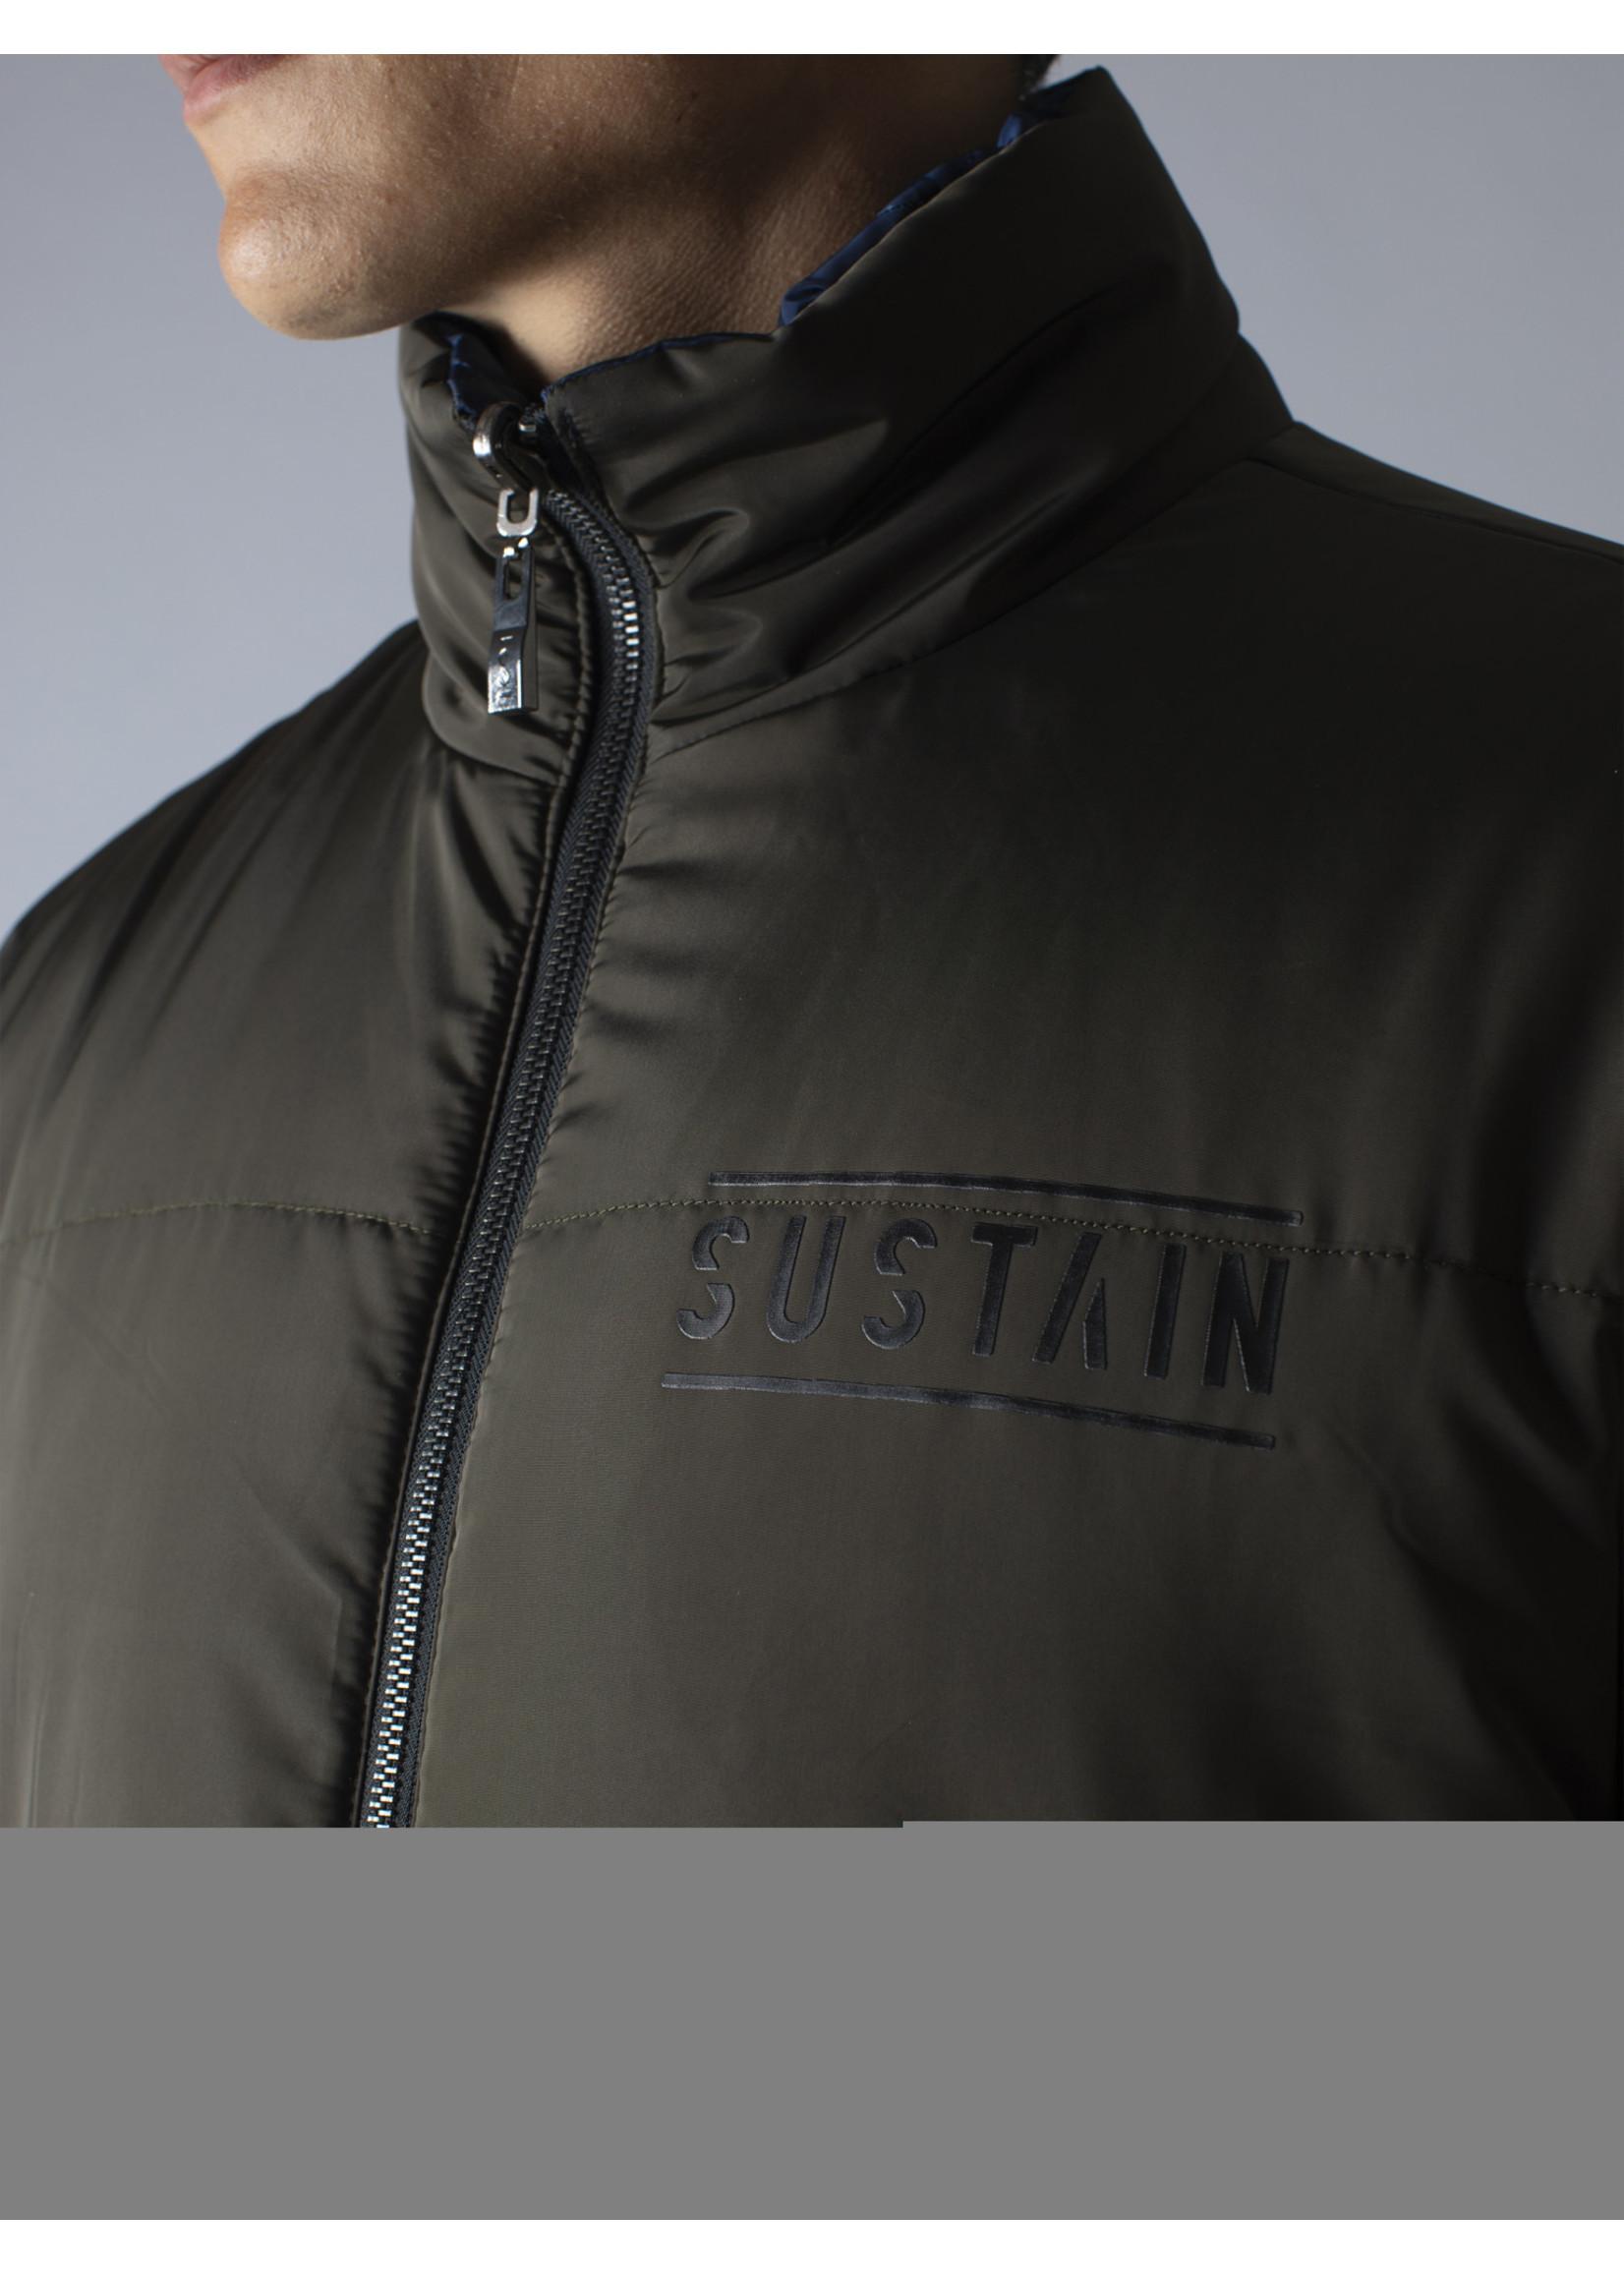 Sustain Sustain Reversible Puffer Jacket - Nine Iron/Blue